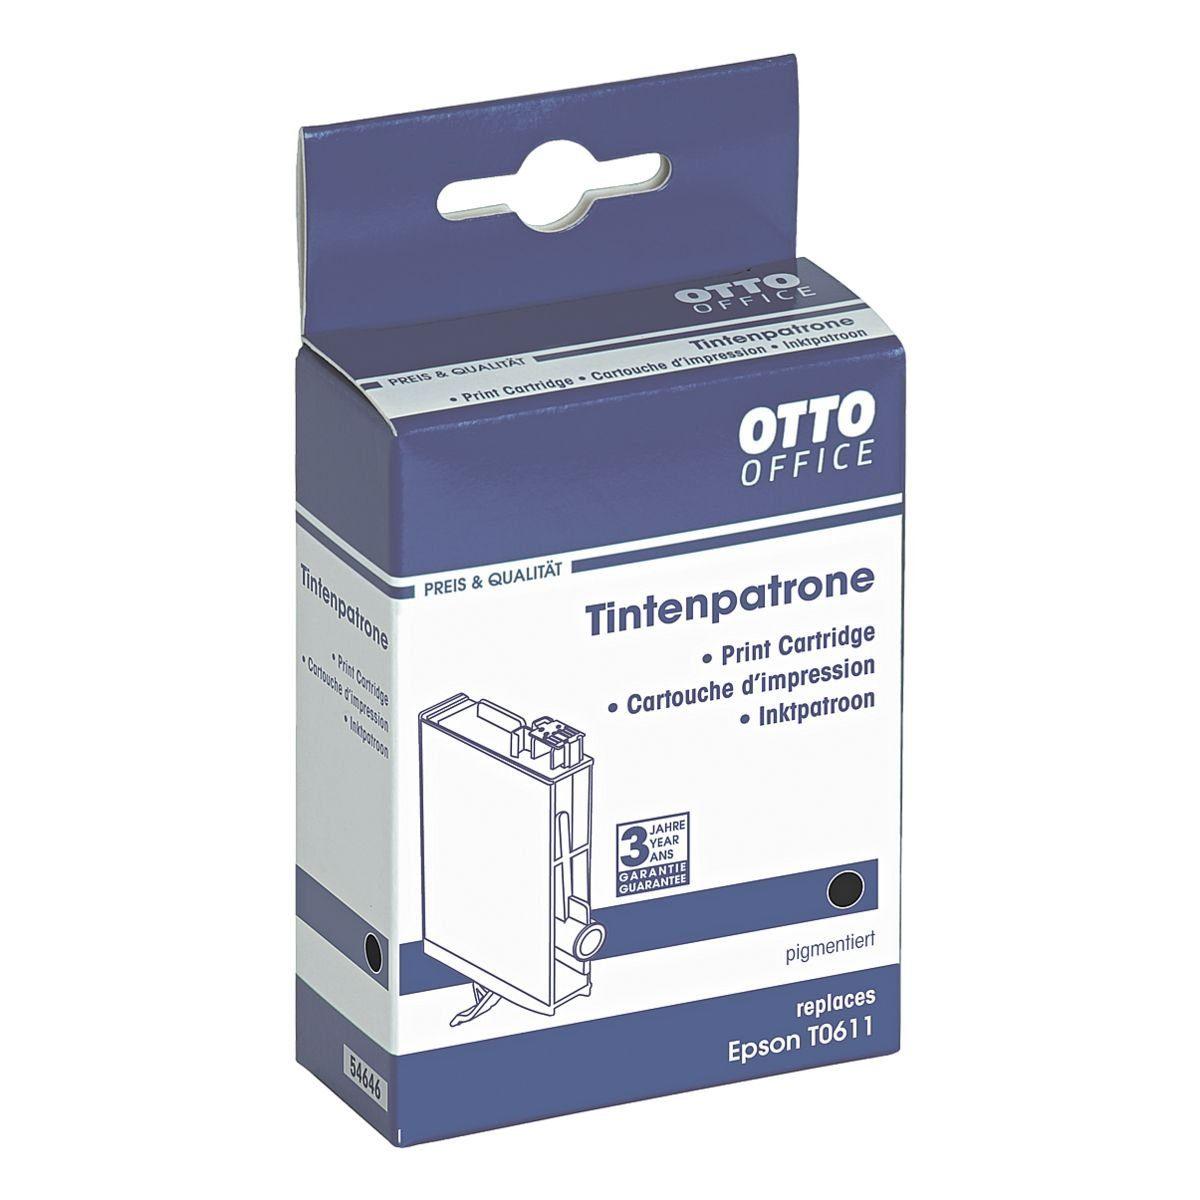 OTTO Office Standard Tintenpatrone ersetzt Epson »T0611«